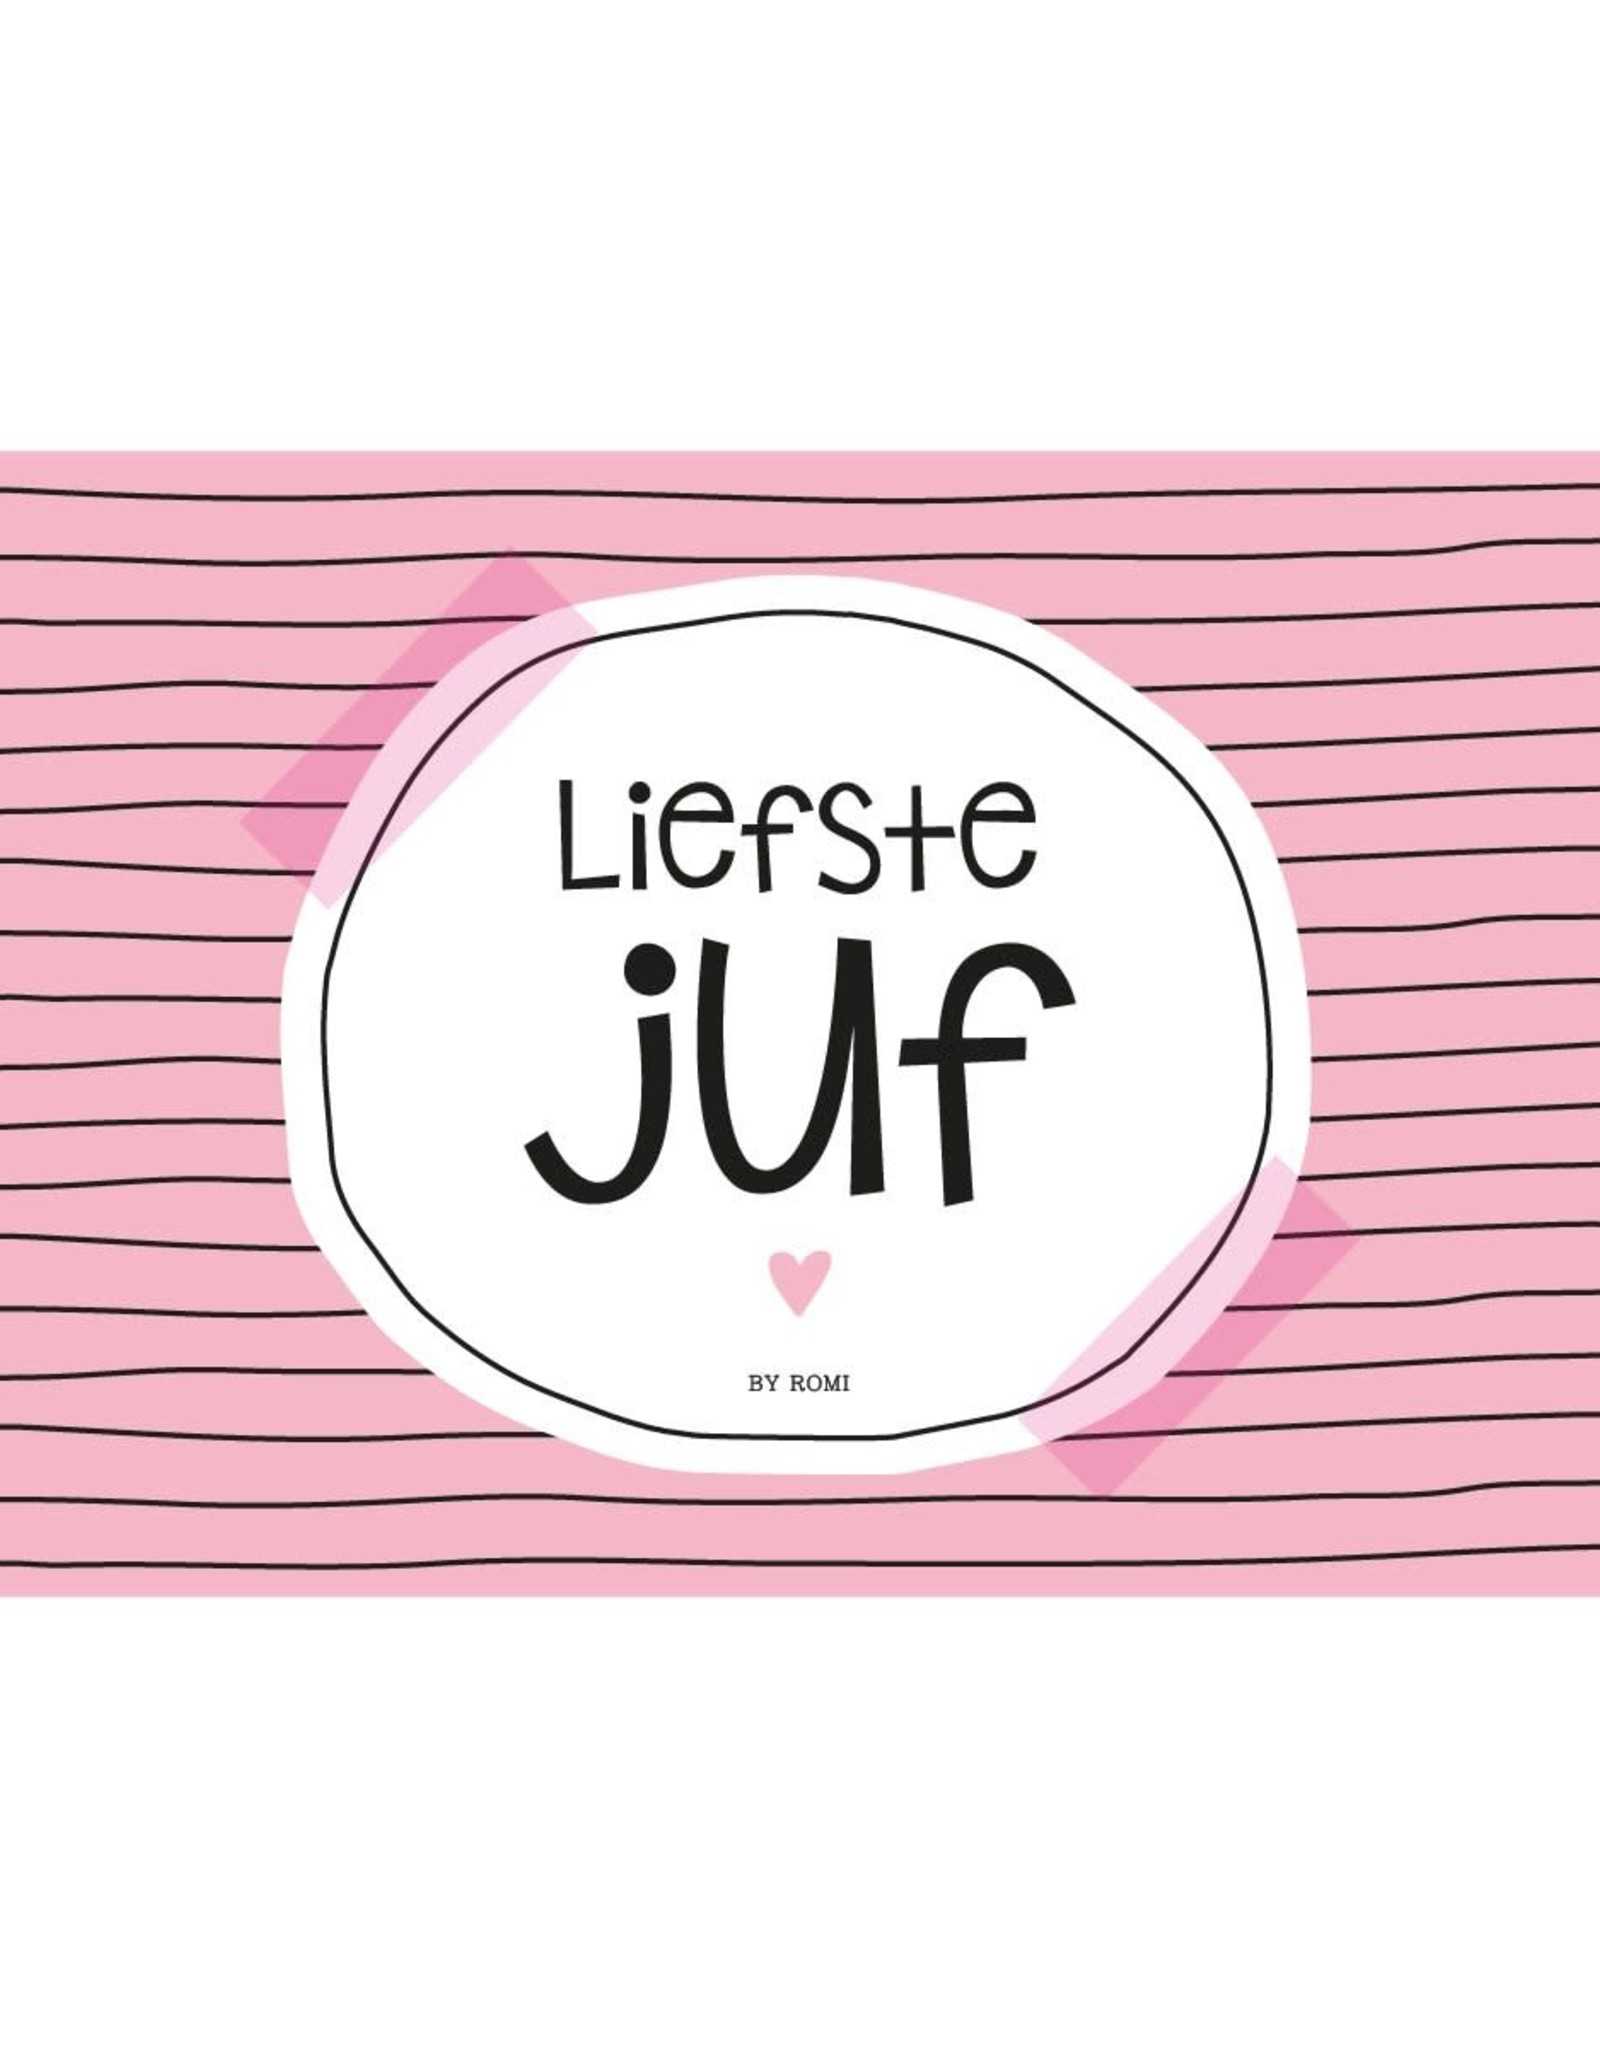 Wenskaart-Liefste juf